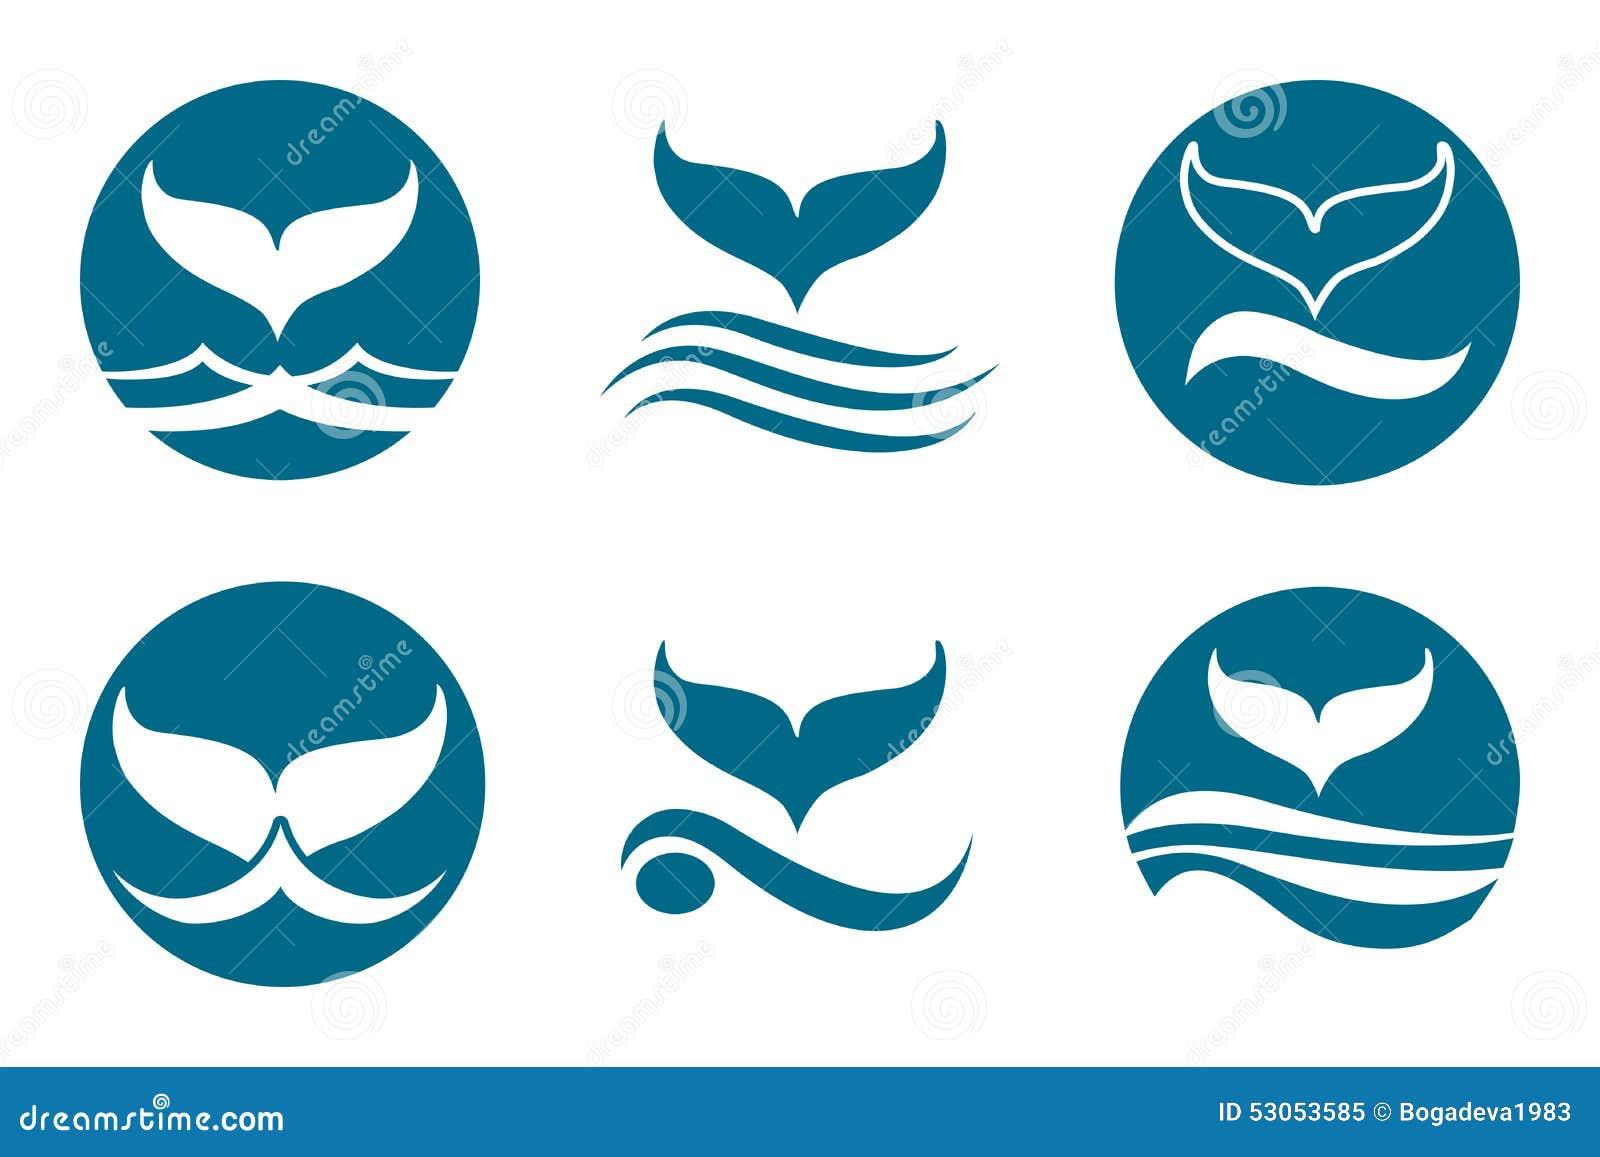 fish dolphin wallpaper